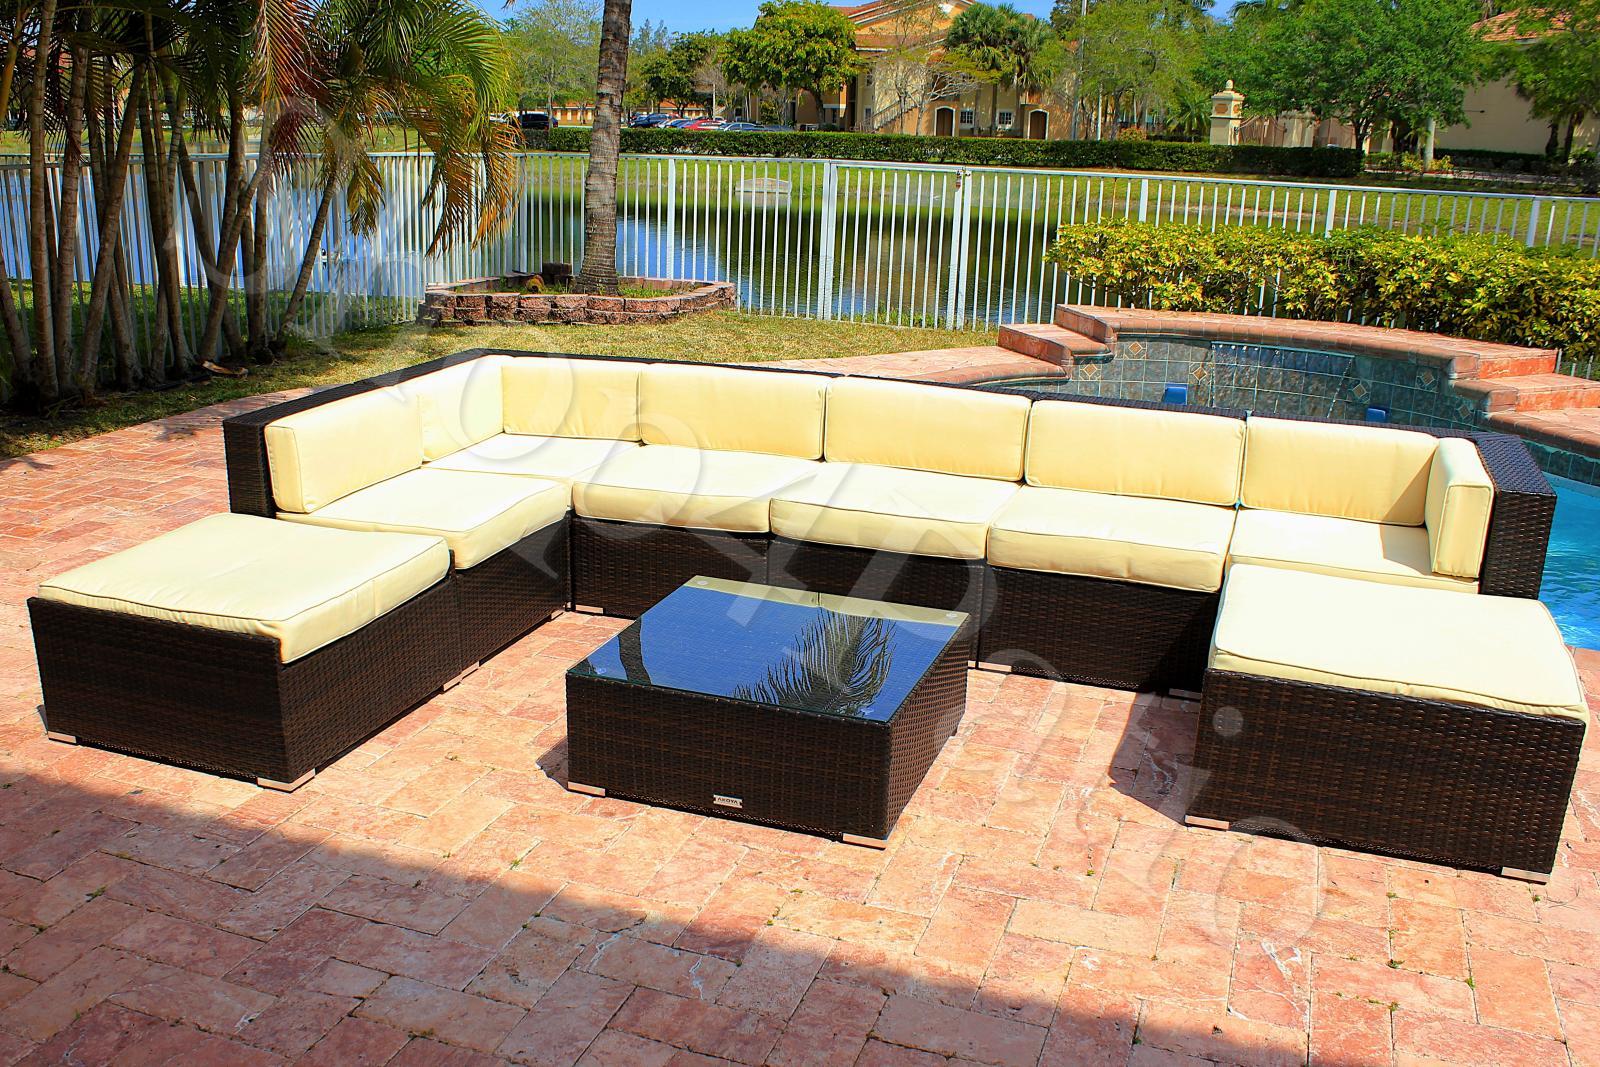 Modern Patio Furniture Garden Wicker Modular Sofa